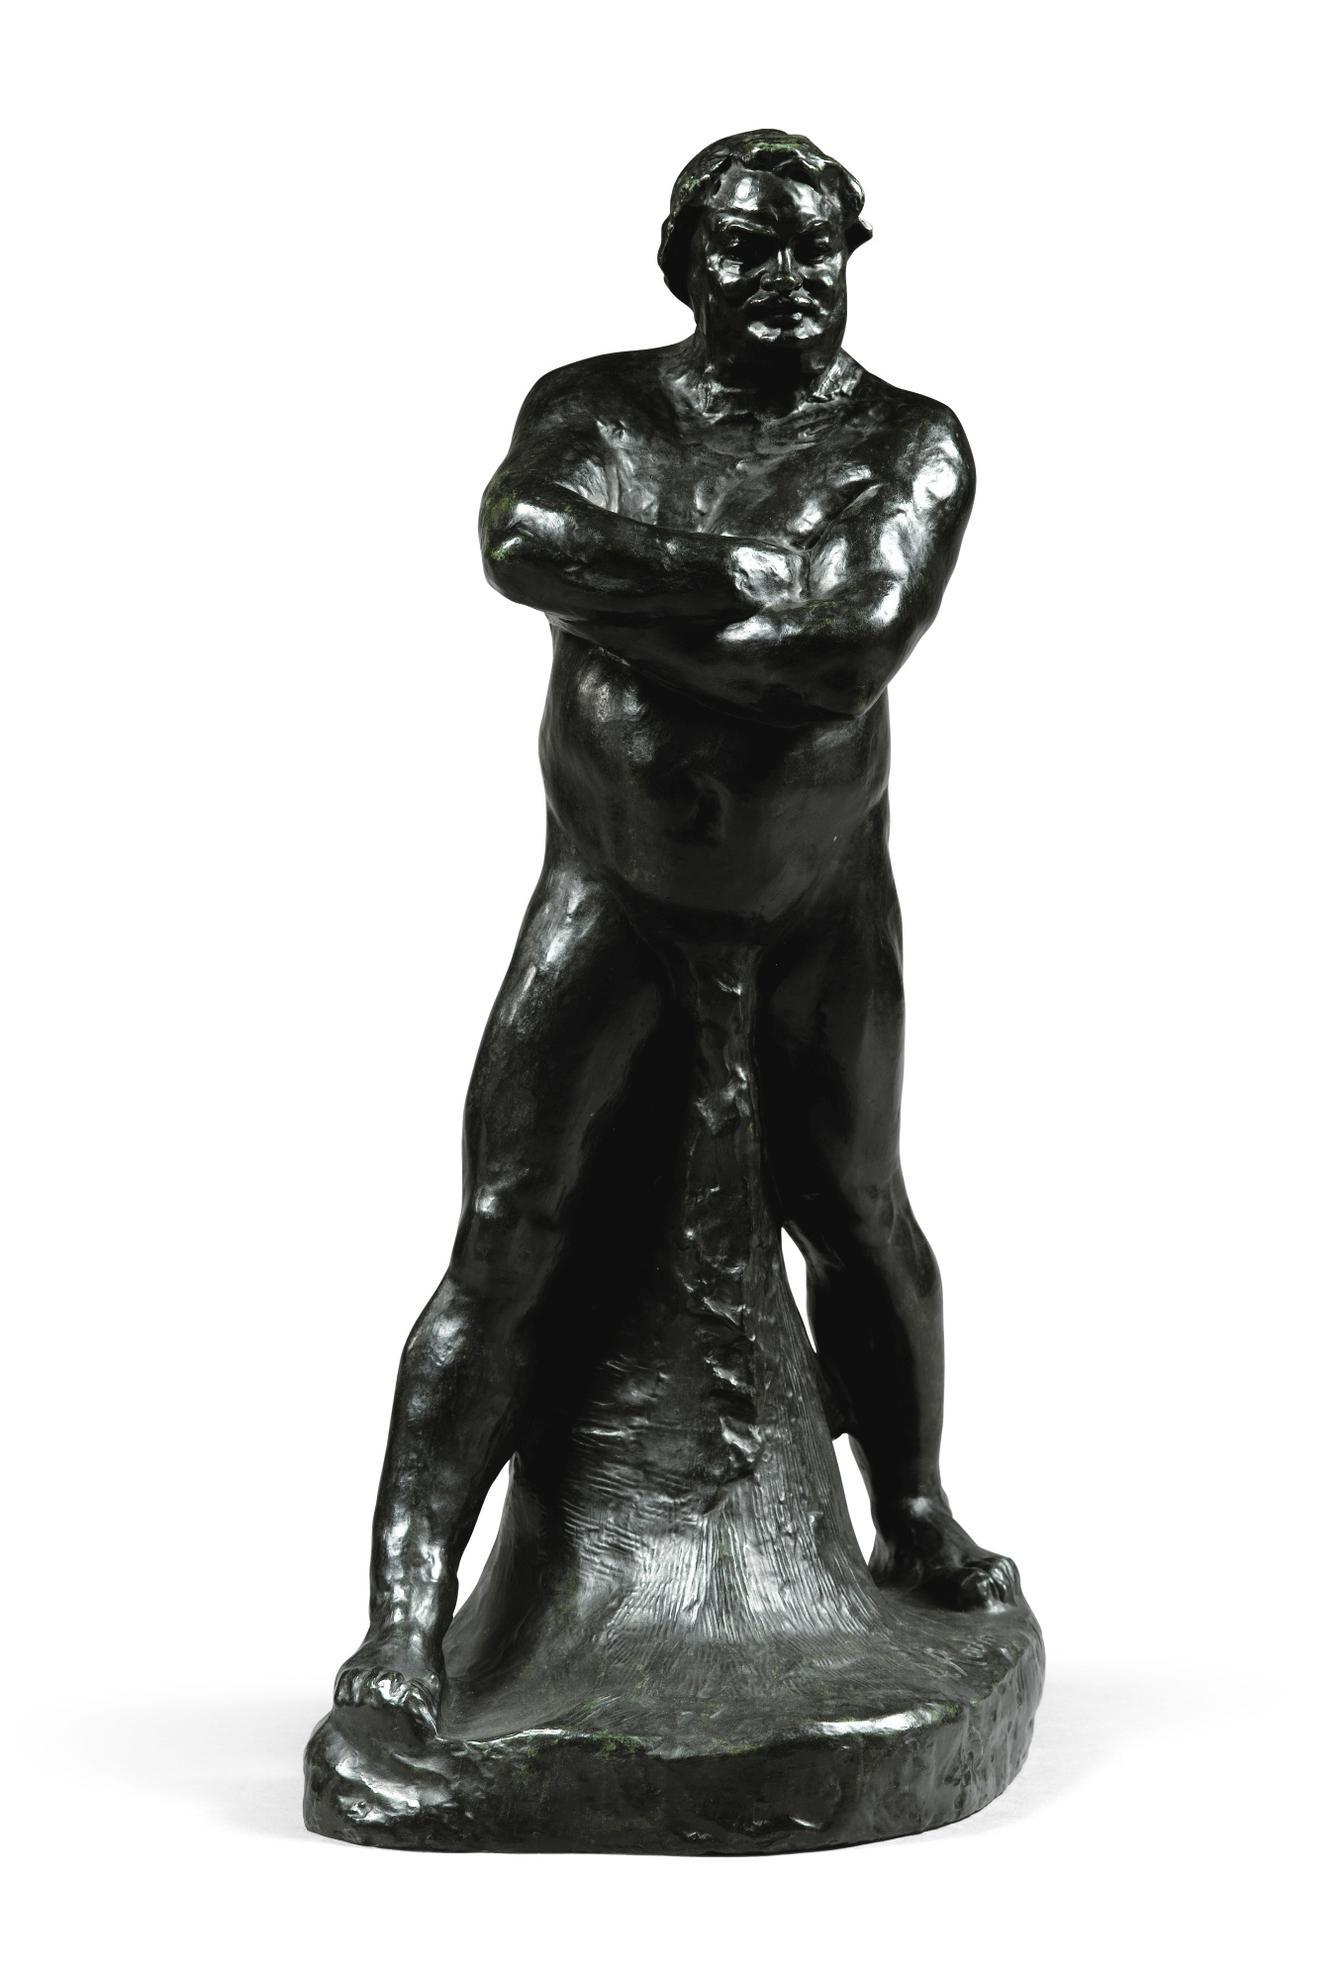 Auguste Rodin-Balzac, Etude Type C, Petit Modele-1893